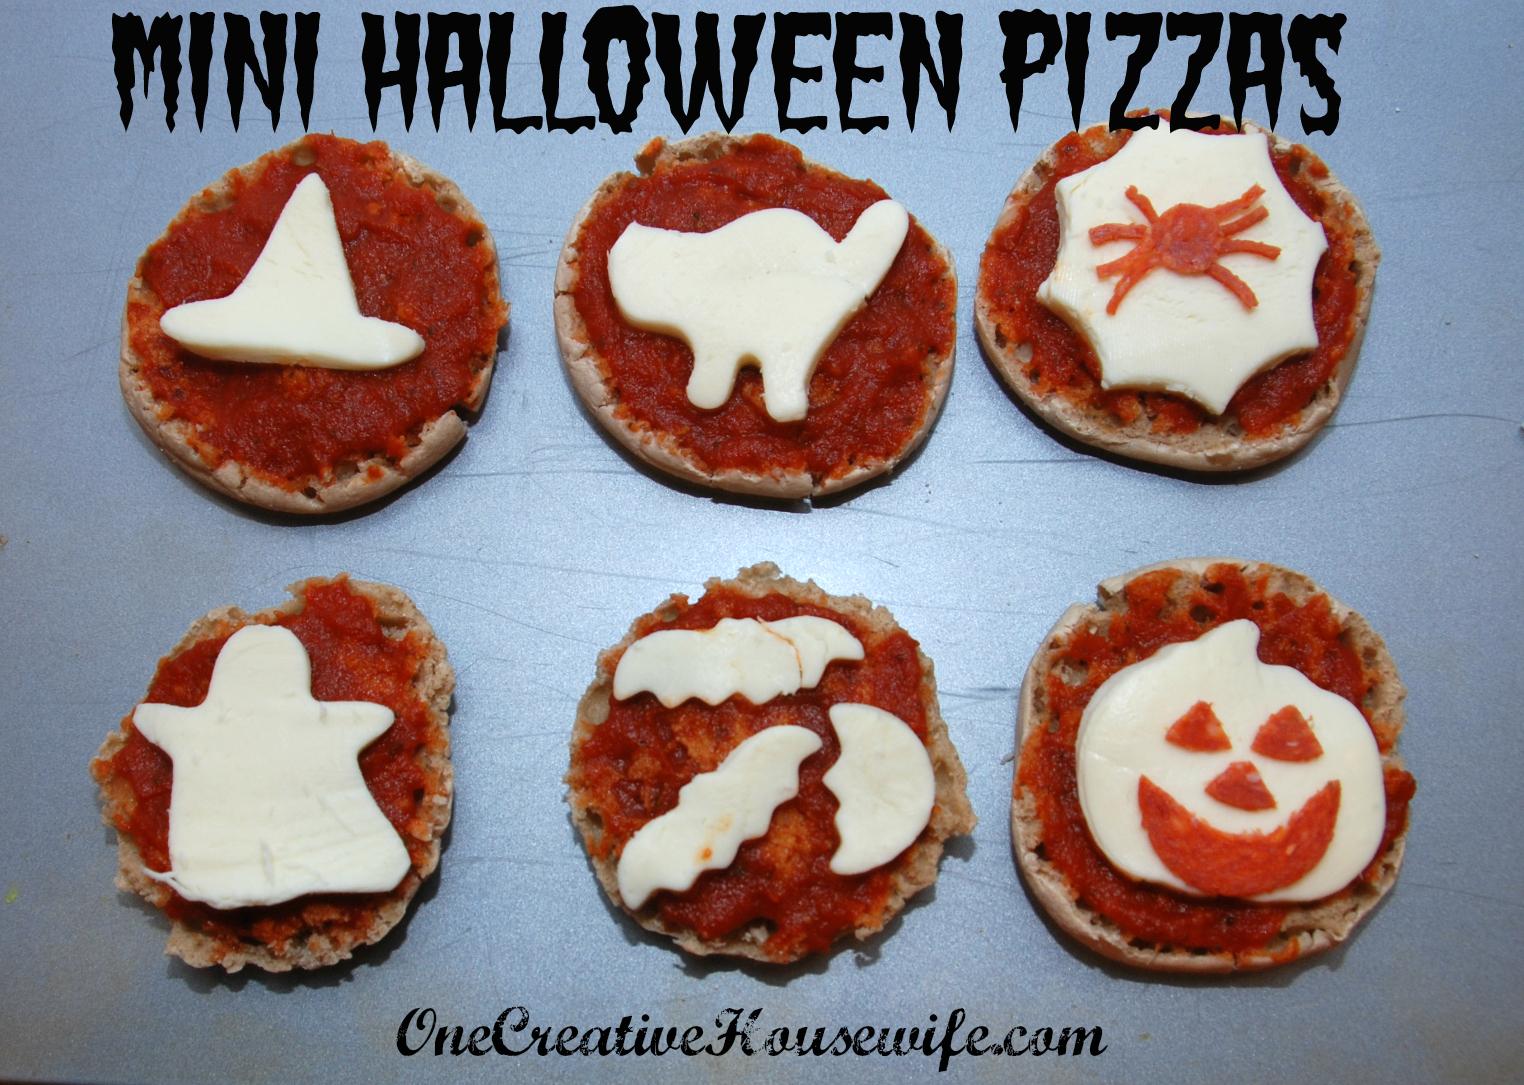 One Creative Housewife: Mini Halloween Pizzas